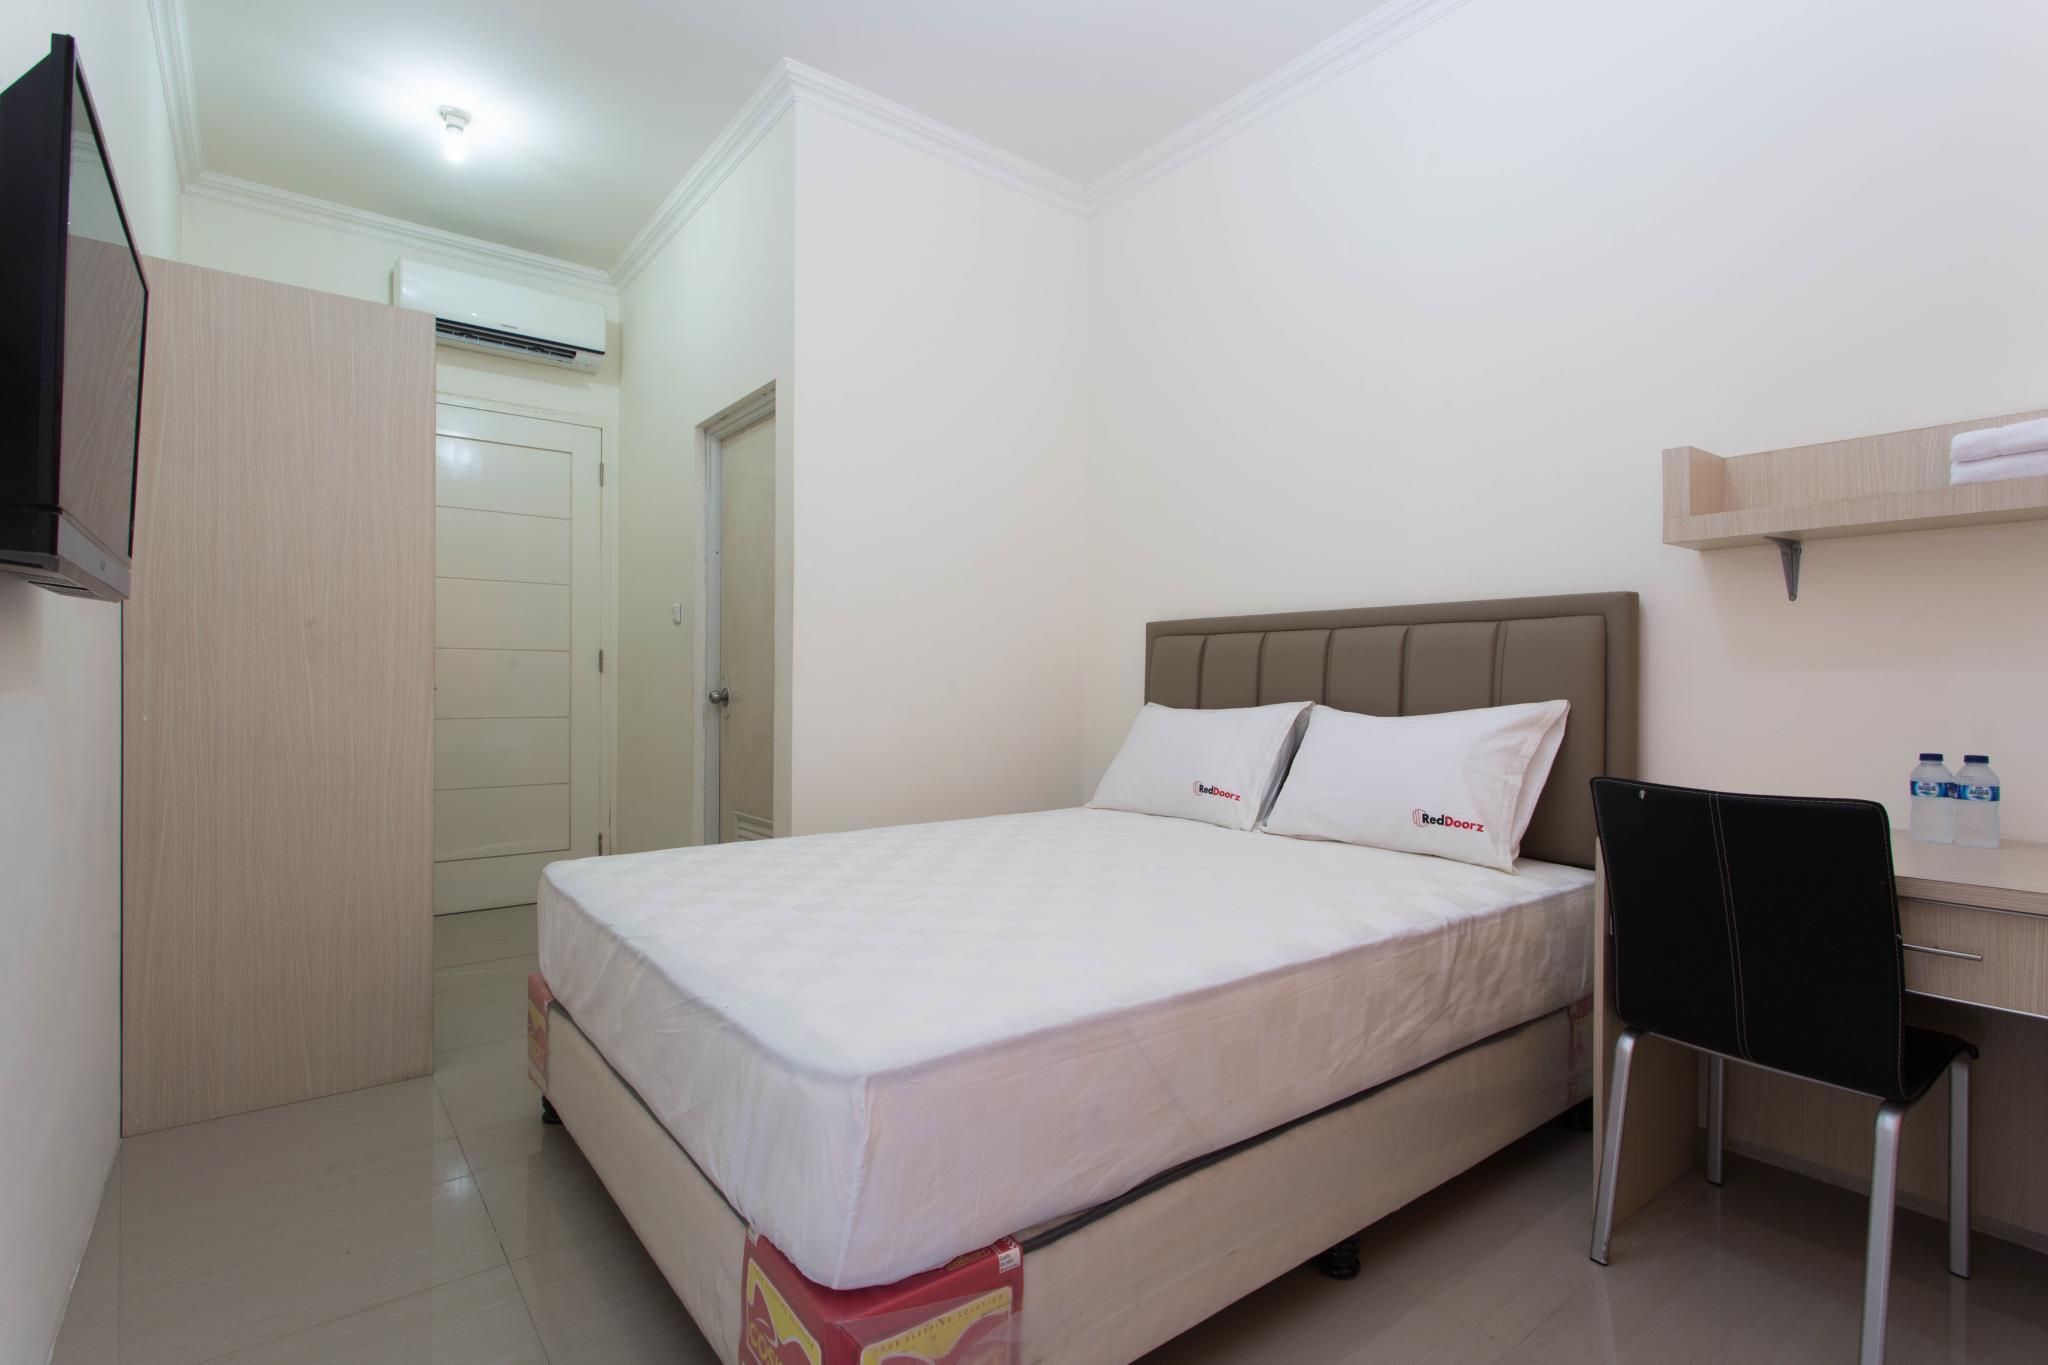 Hotel RedDoorz Near Siloam Karawaci - Jl. Permata Indah II B2 No. 44, Karawaci Tangerang Lippo Karawaci - Tangerang